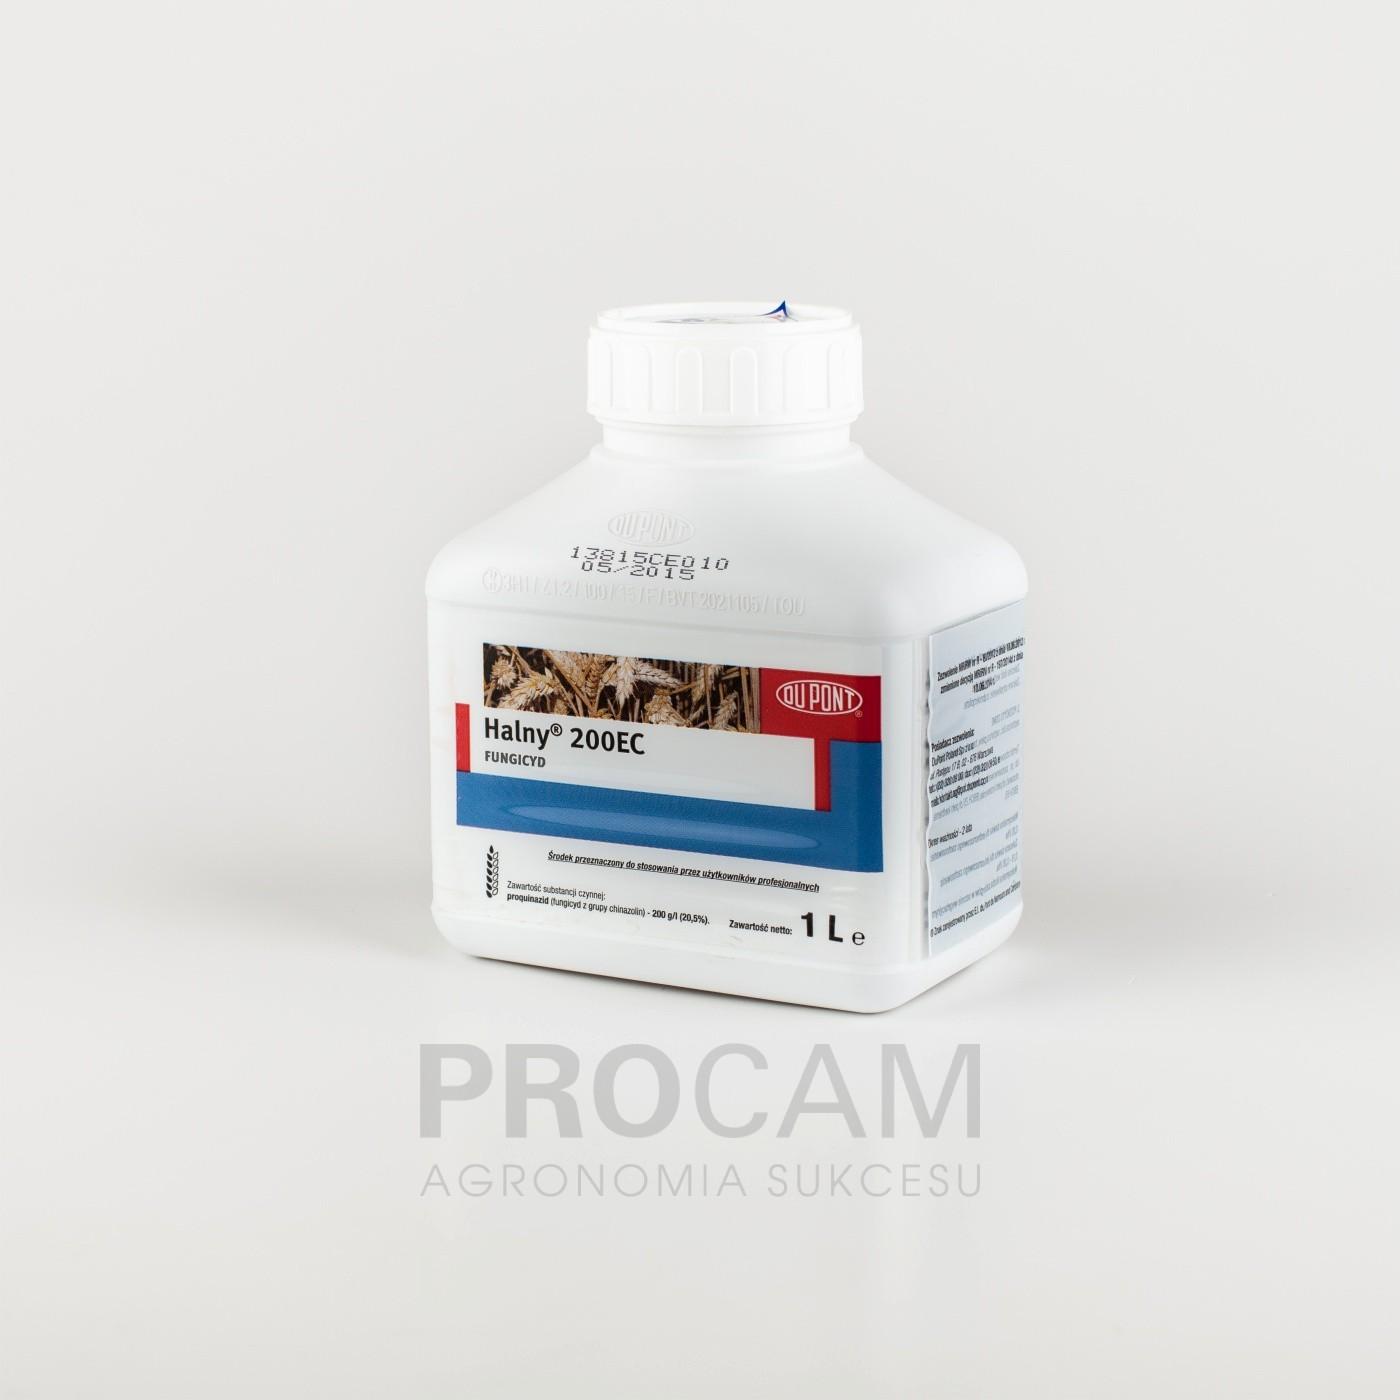 Halny 200 Ec 1l Corteva Fungicyd Procam Agronomia Sukcesu